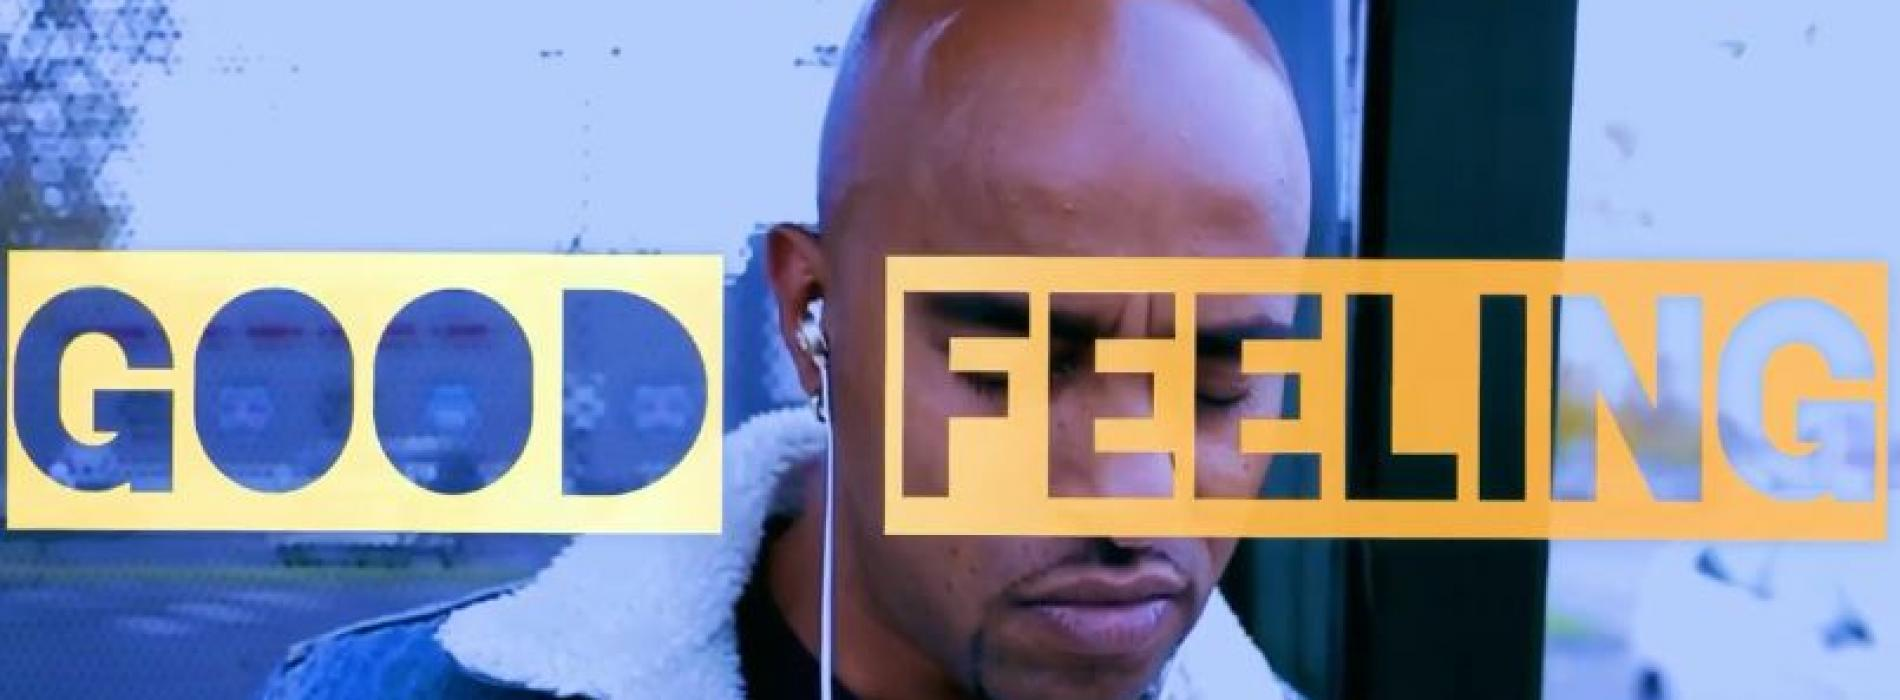 New Music : J-NiL- Good Feeling (Remix)